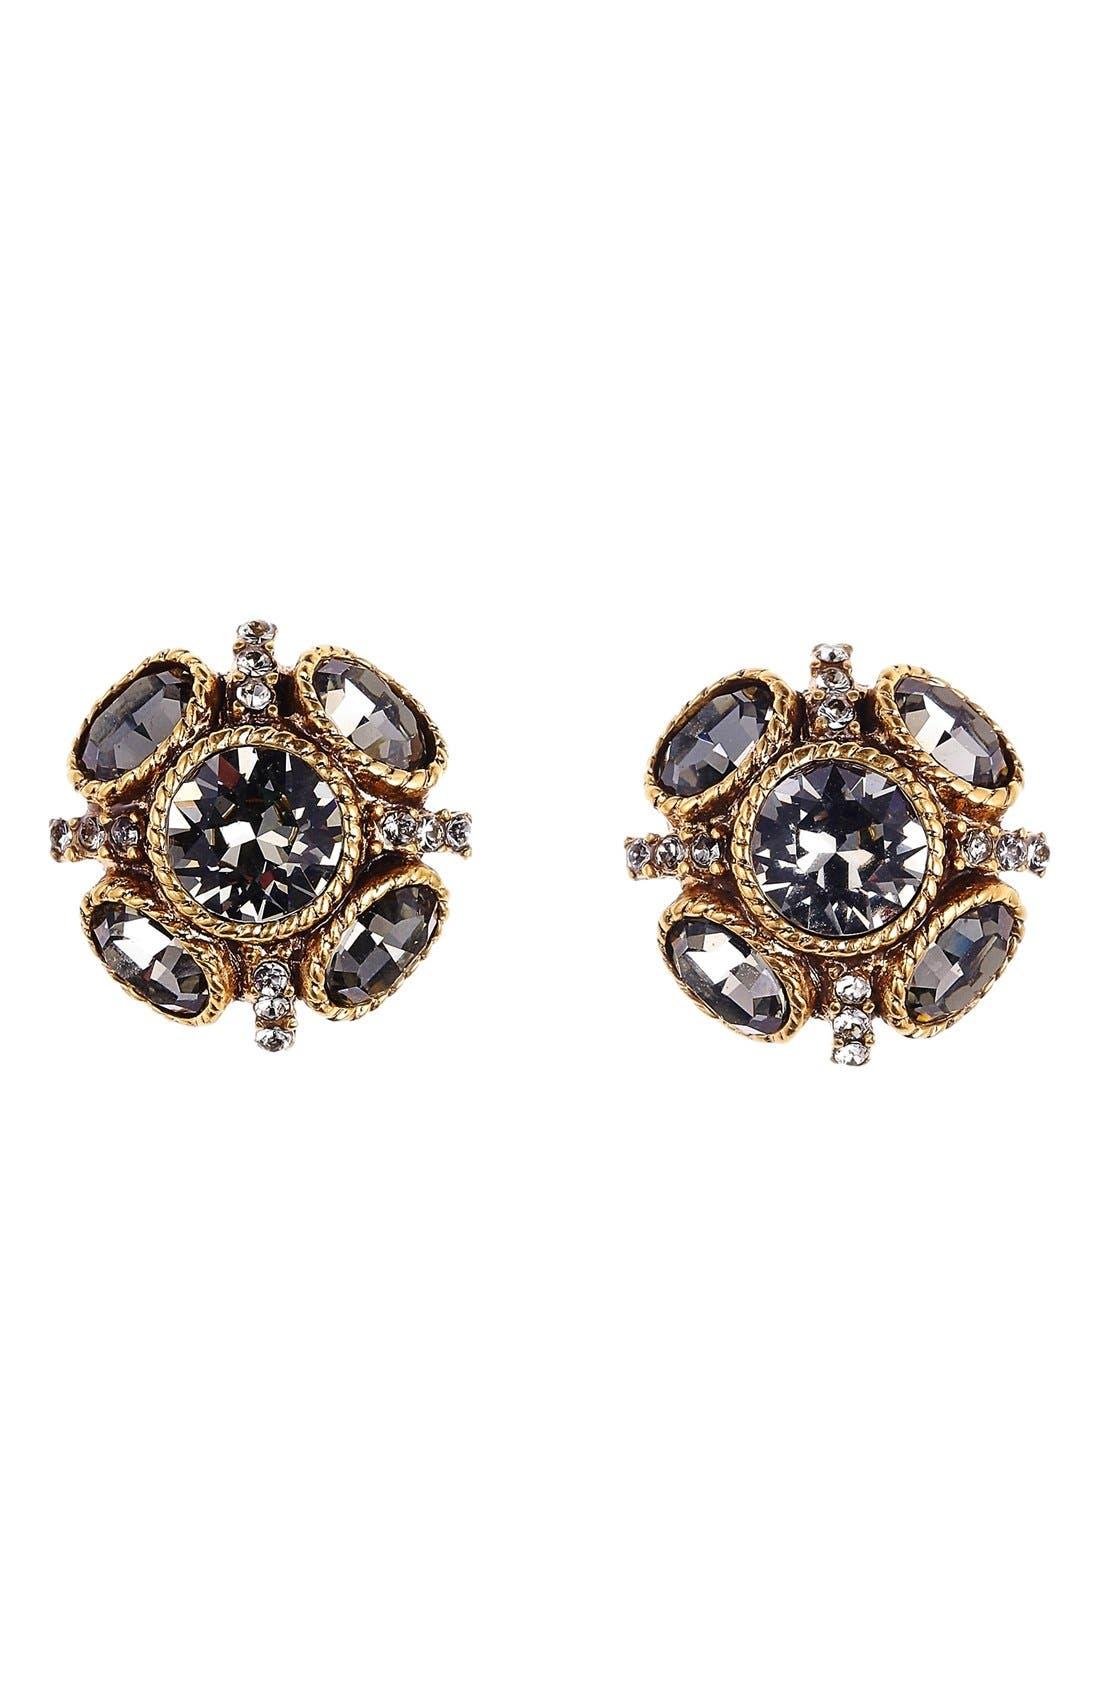 Oscar de la Renta 'Classic Button' Stud Earrings